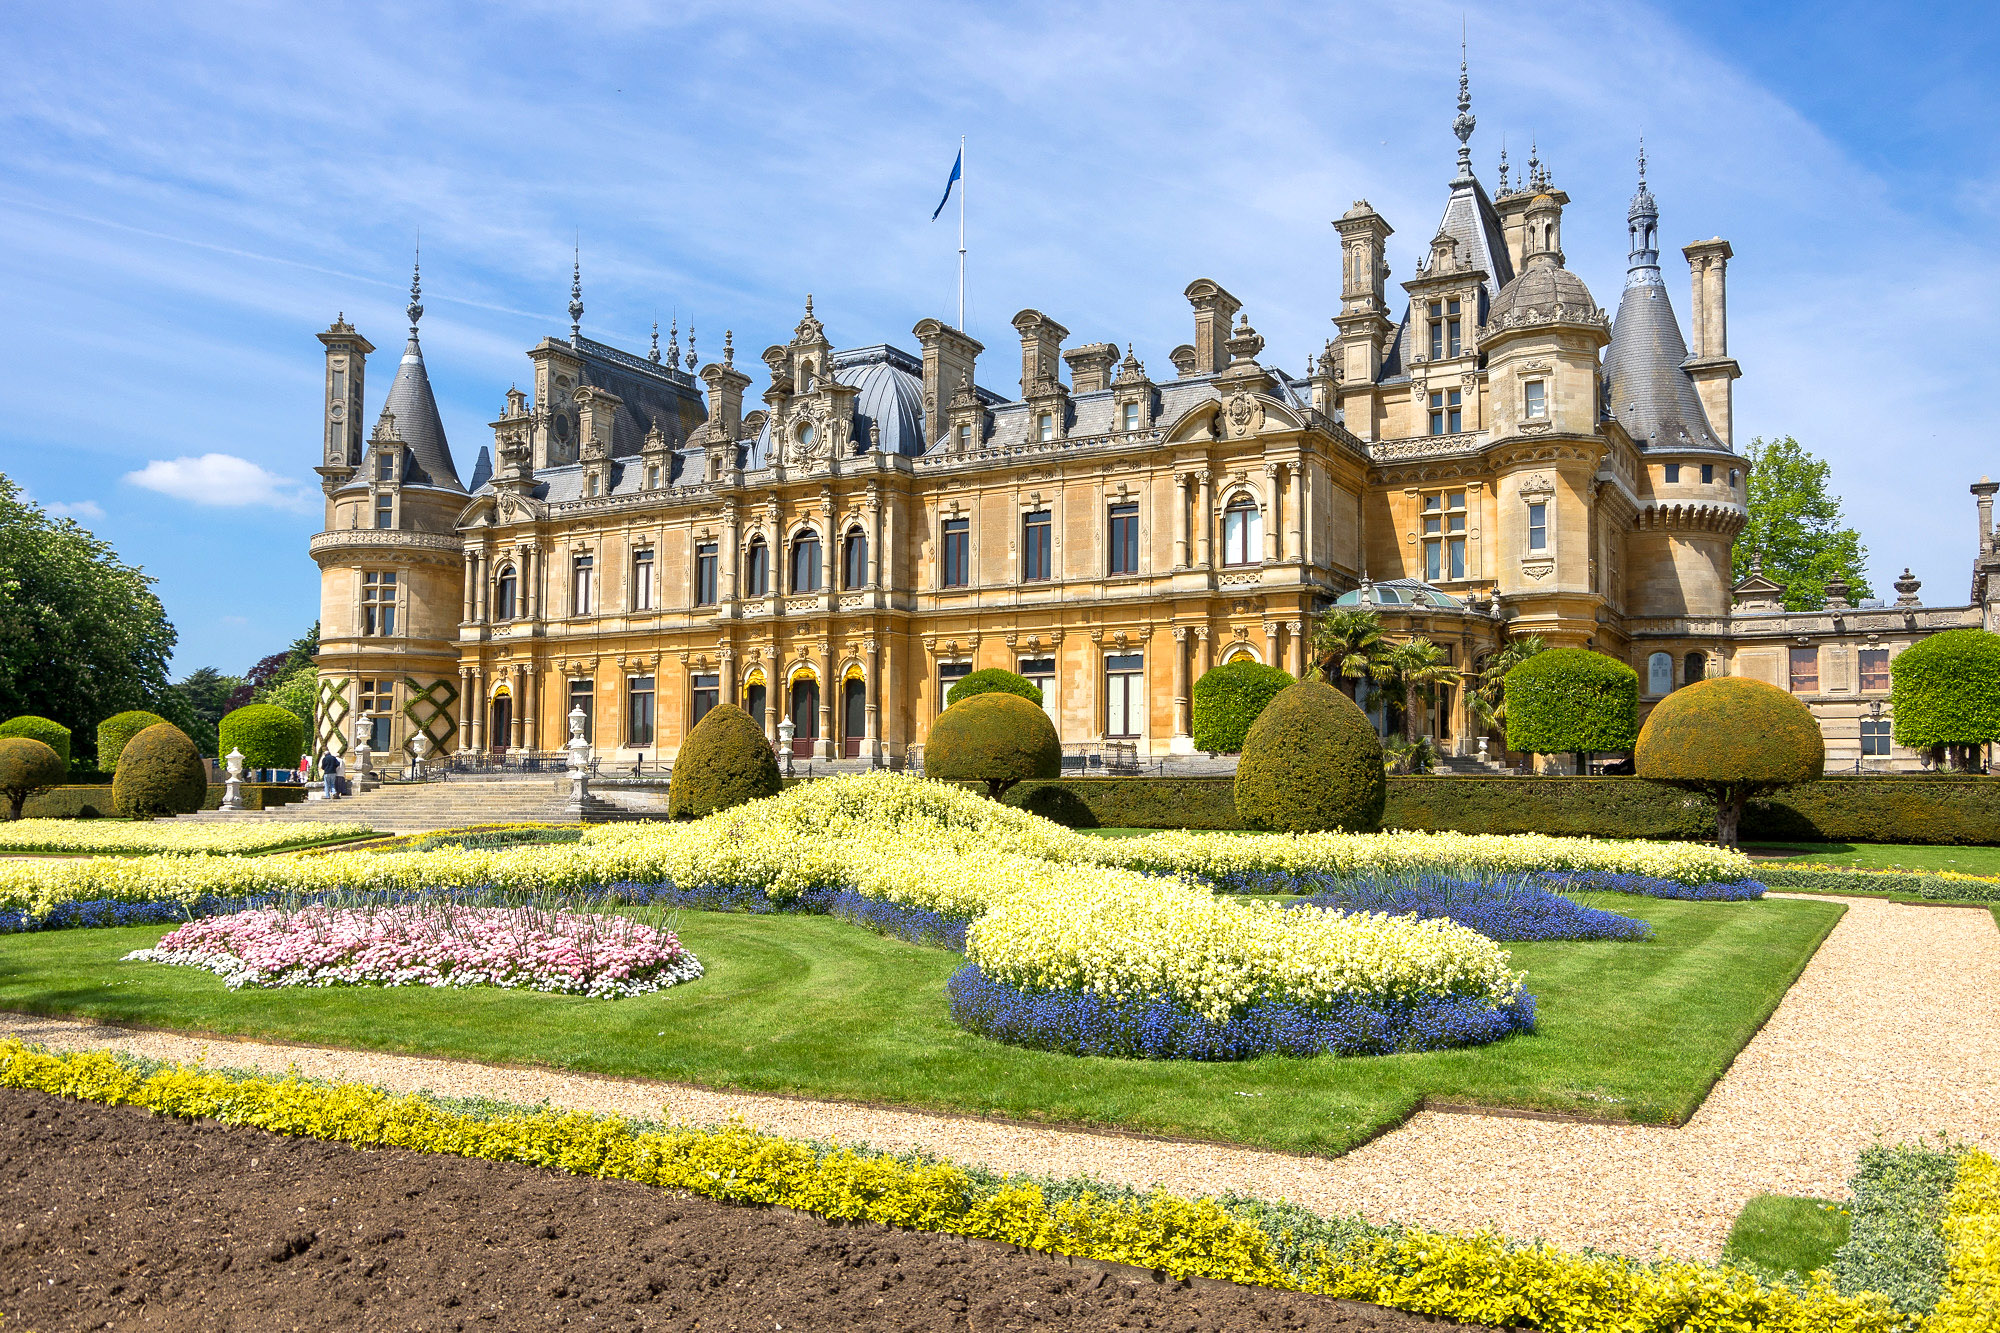 Waddesdon Manor, Buckinghamshire by Ken Barley.jpg